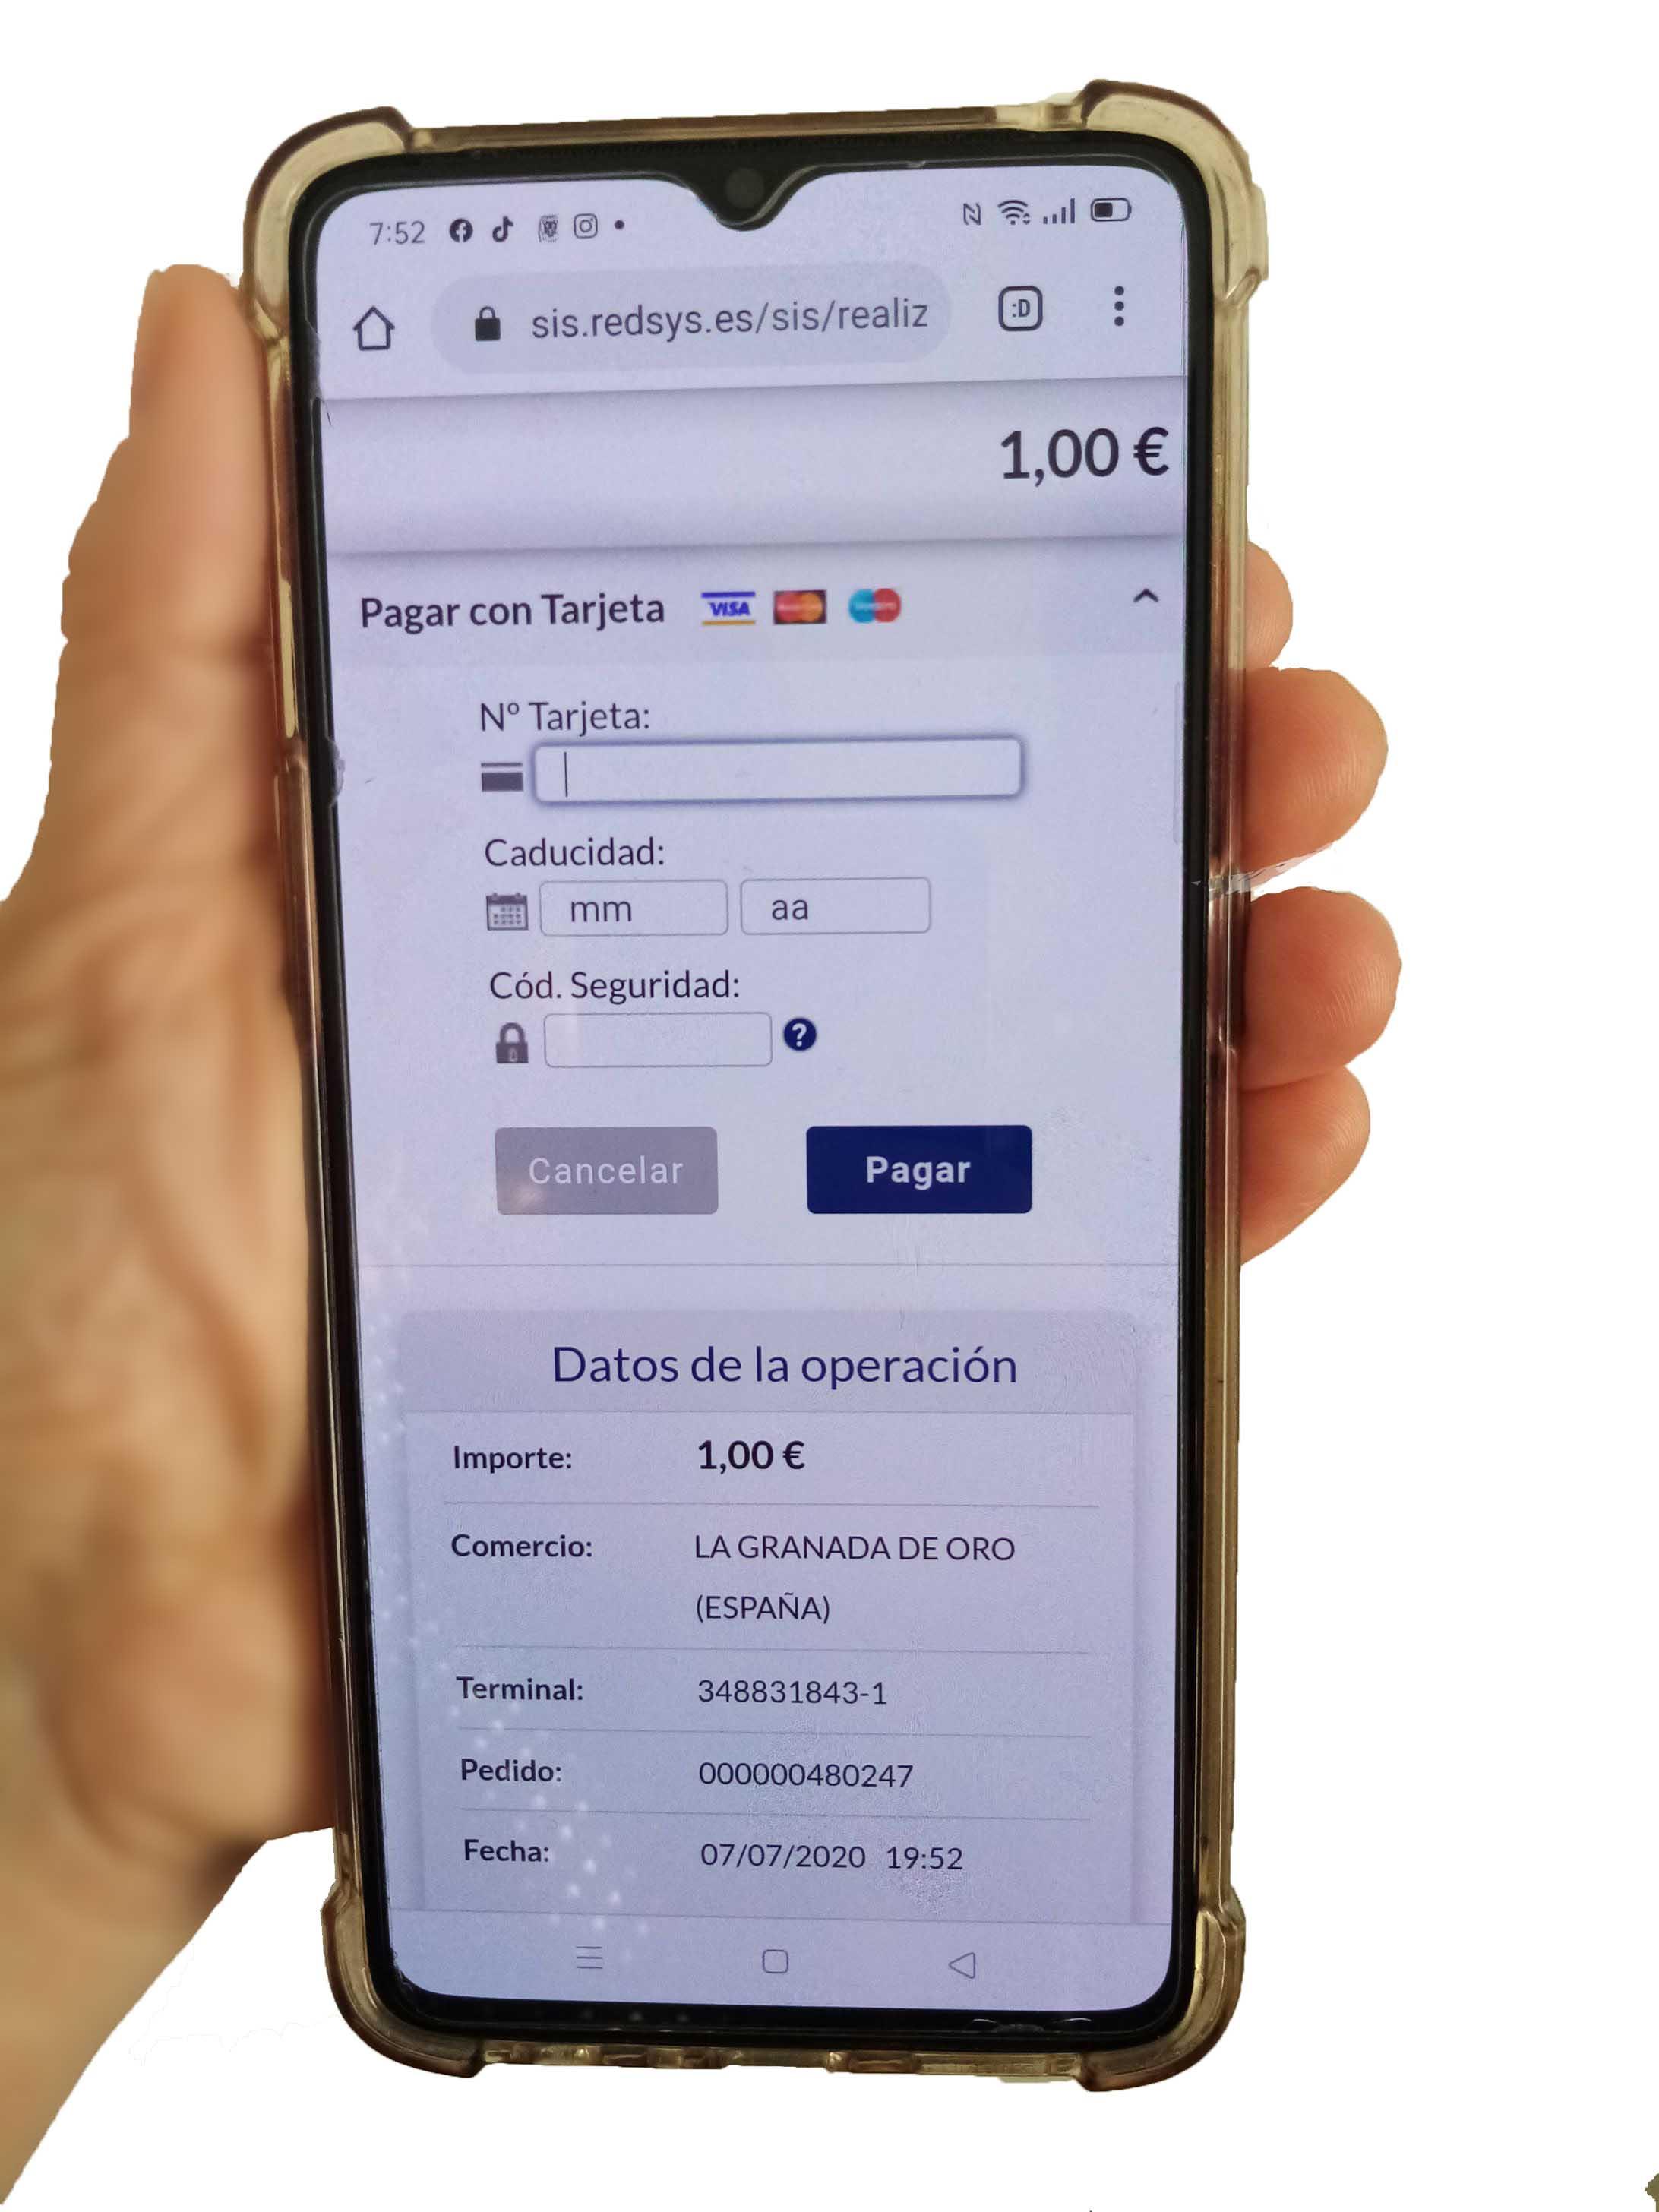 Pagar la loteria online con tarjeta del BBVA